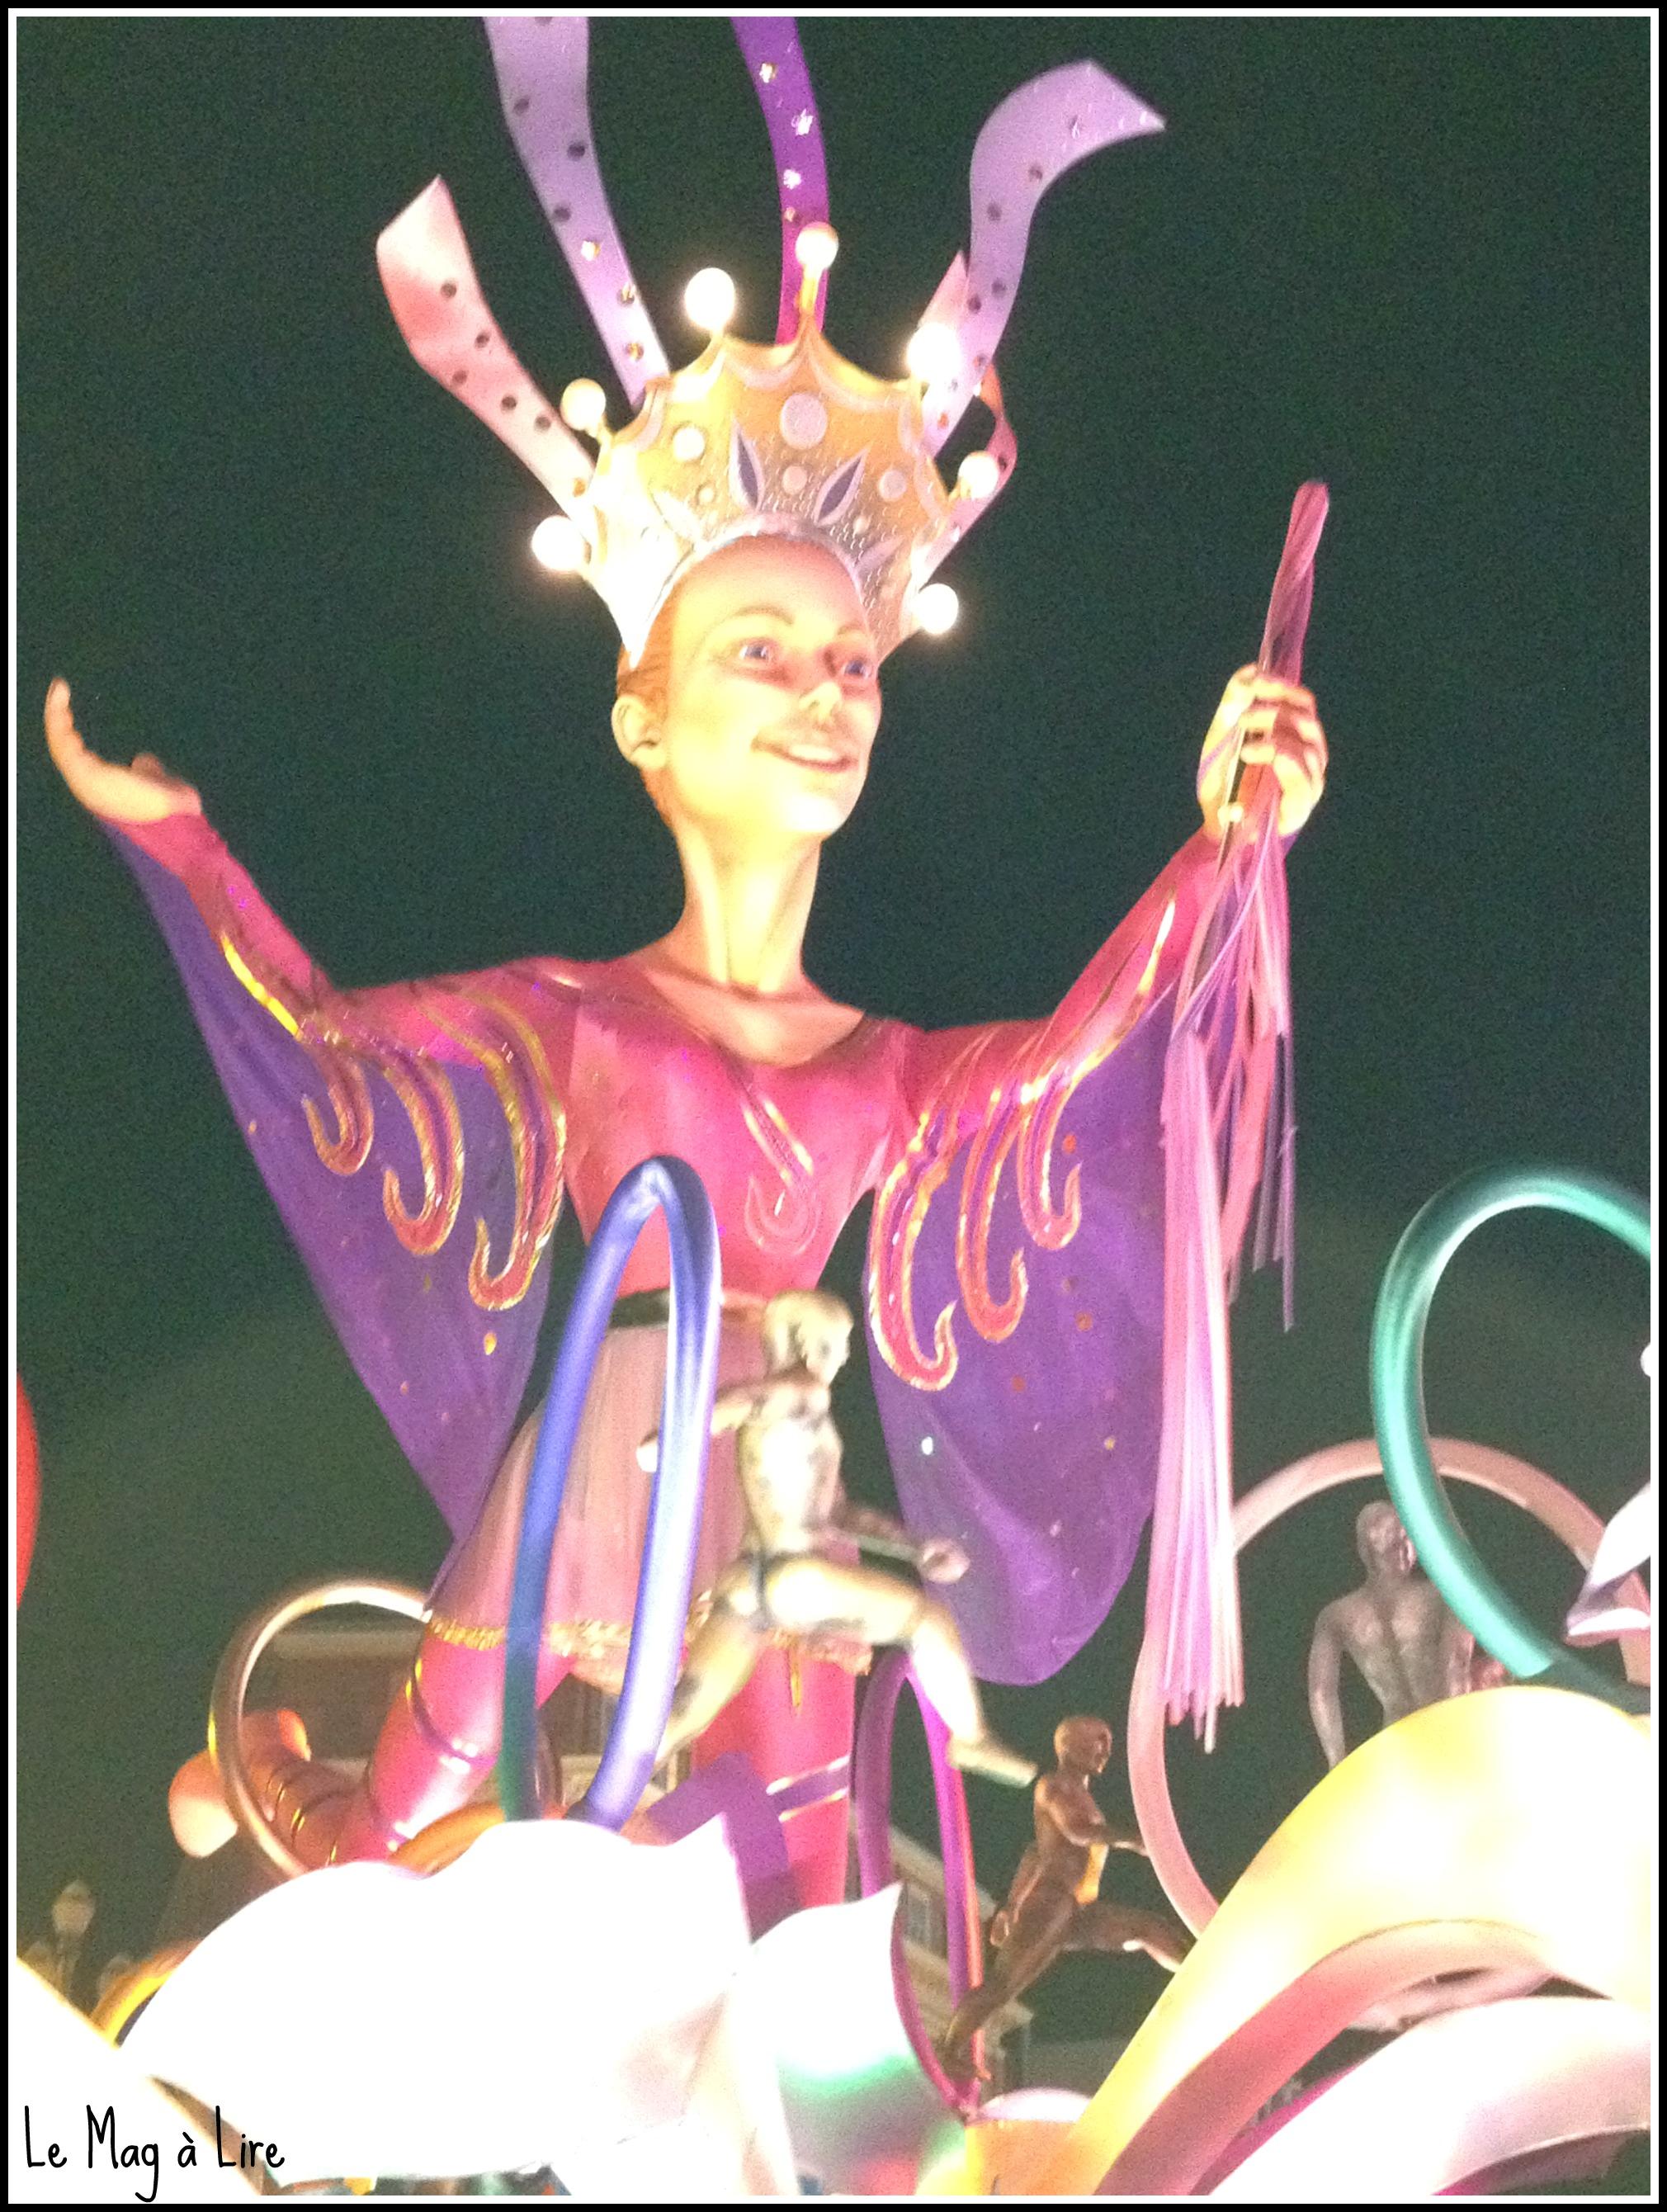 Carnaval Nice blog lifestyle marseille